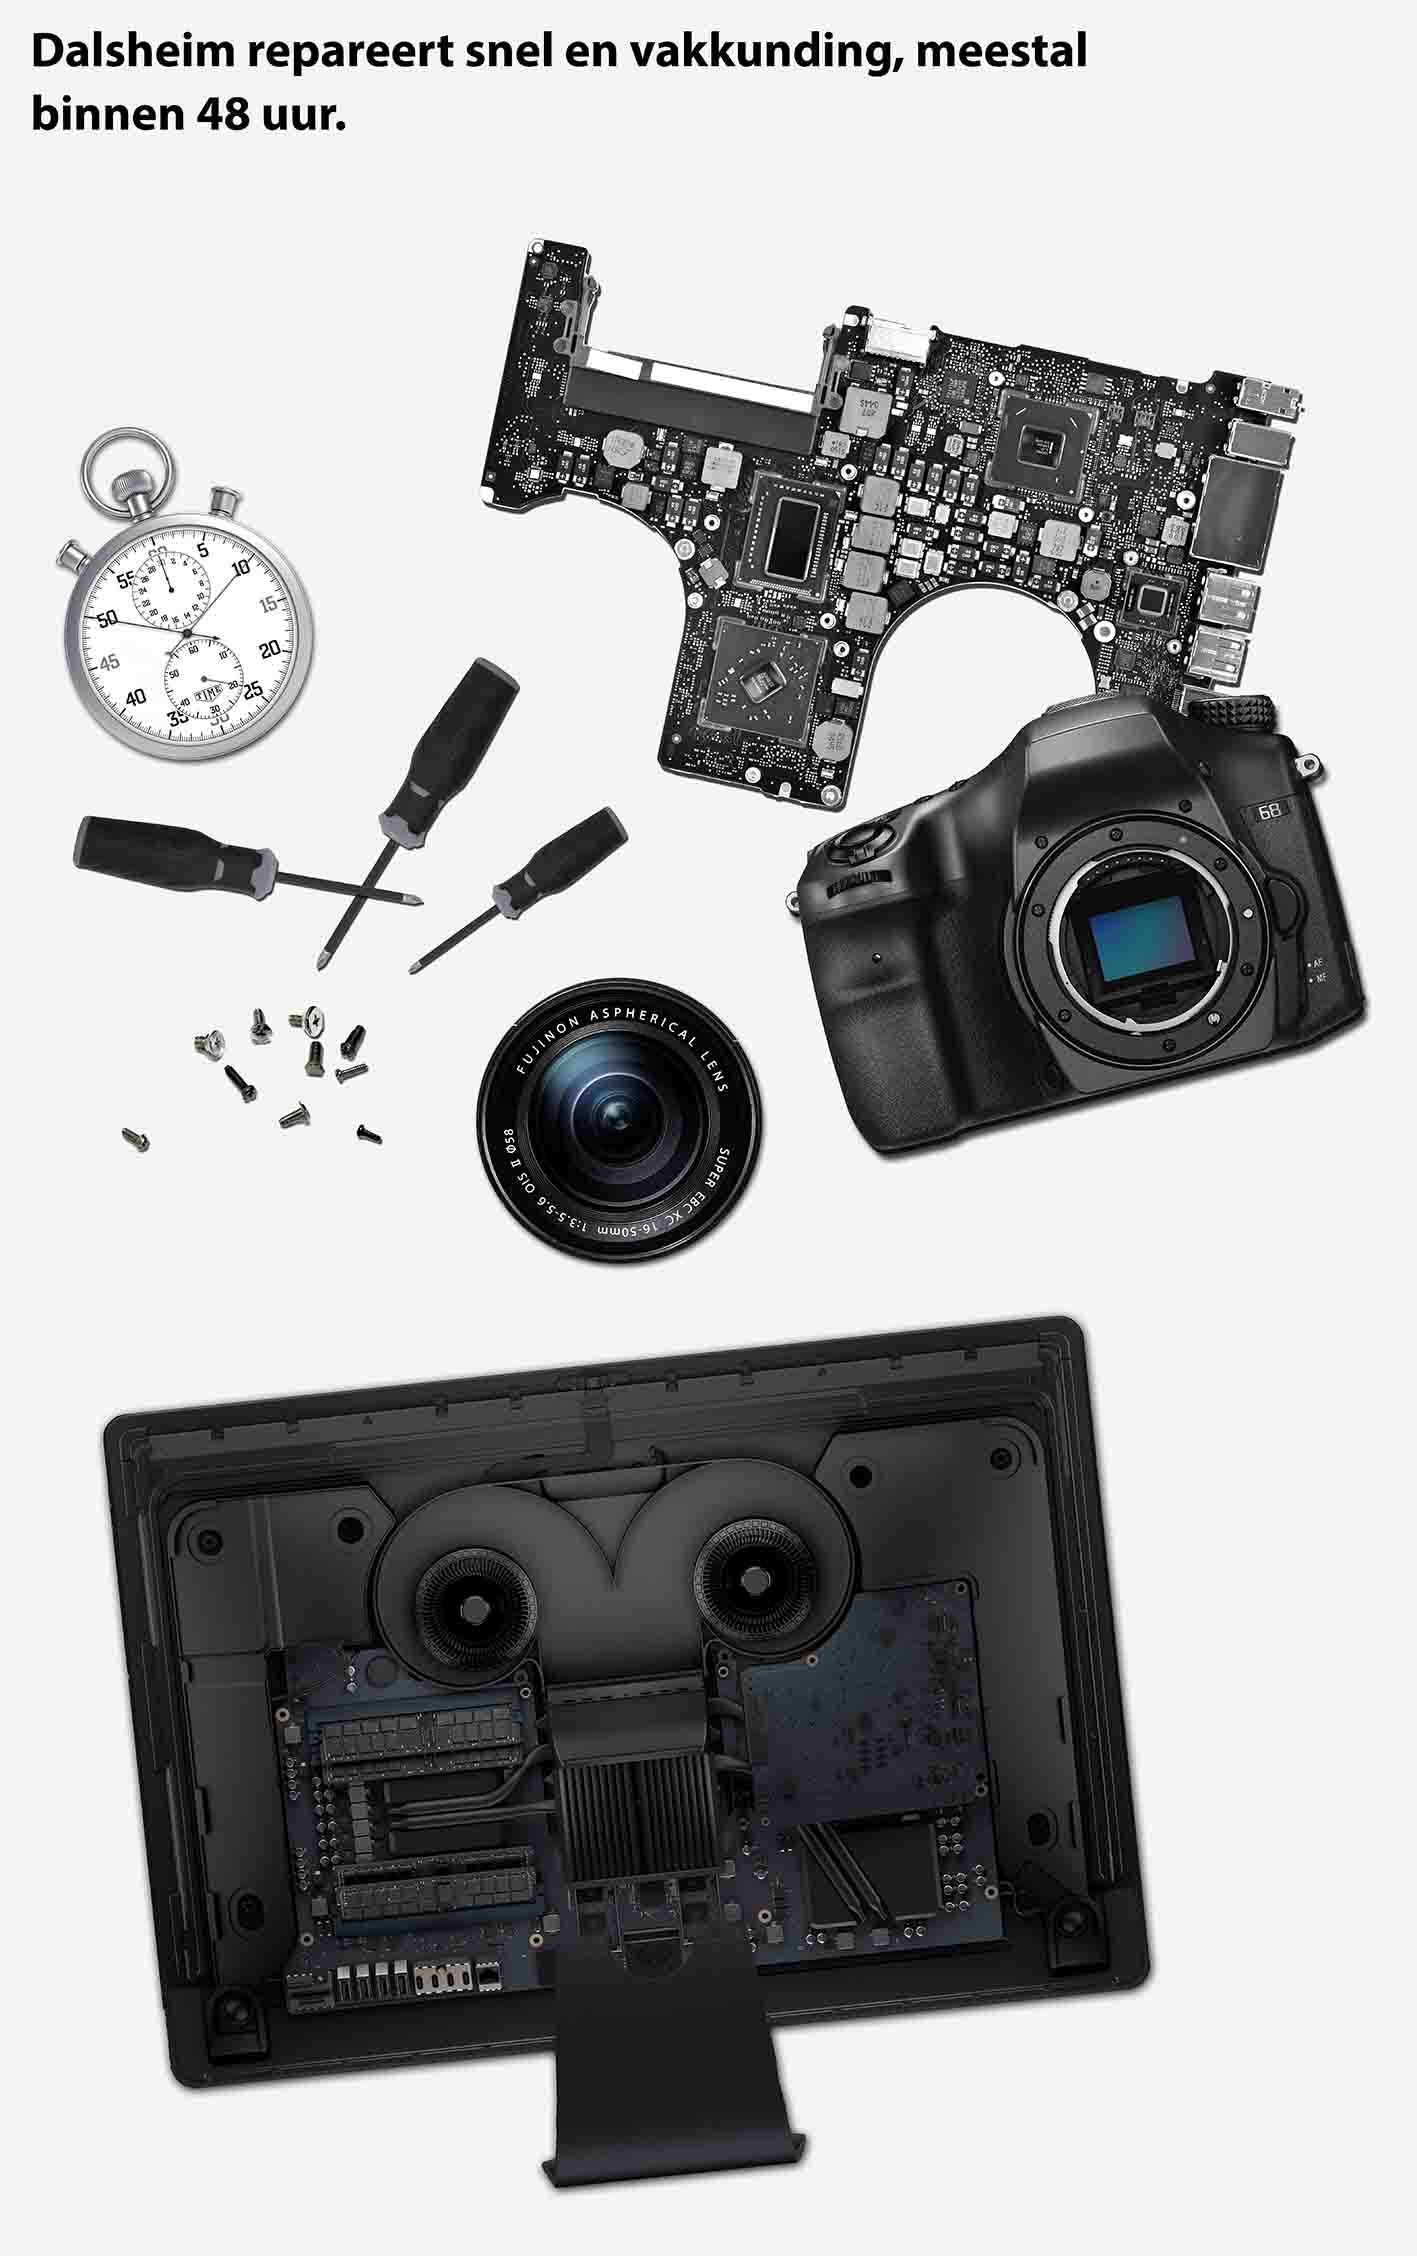 reparaties van foto camera's apple computers imac